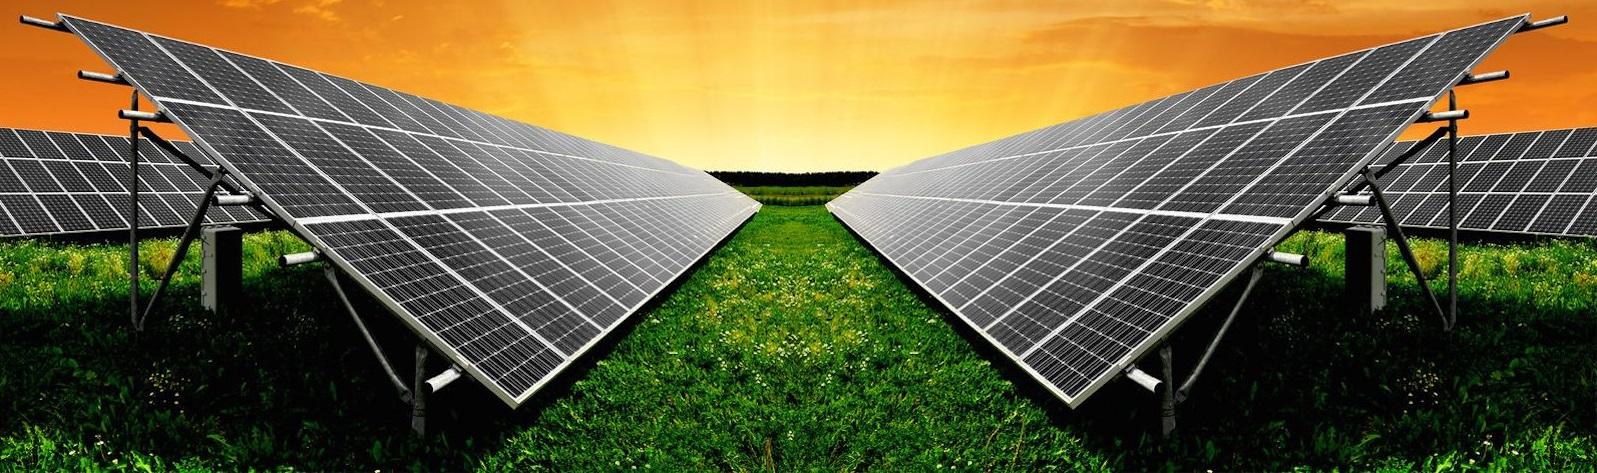 solar-panel-sunset